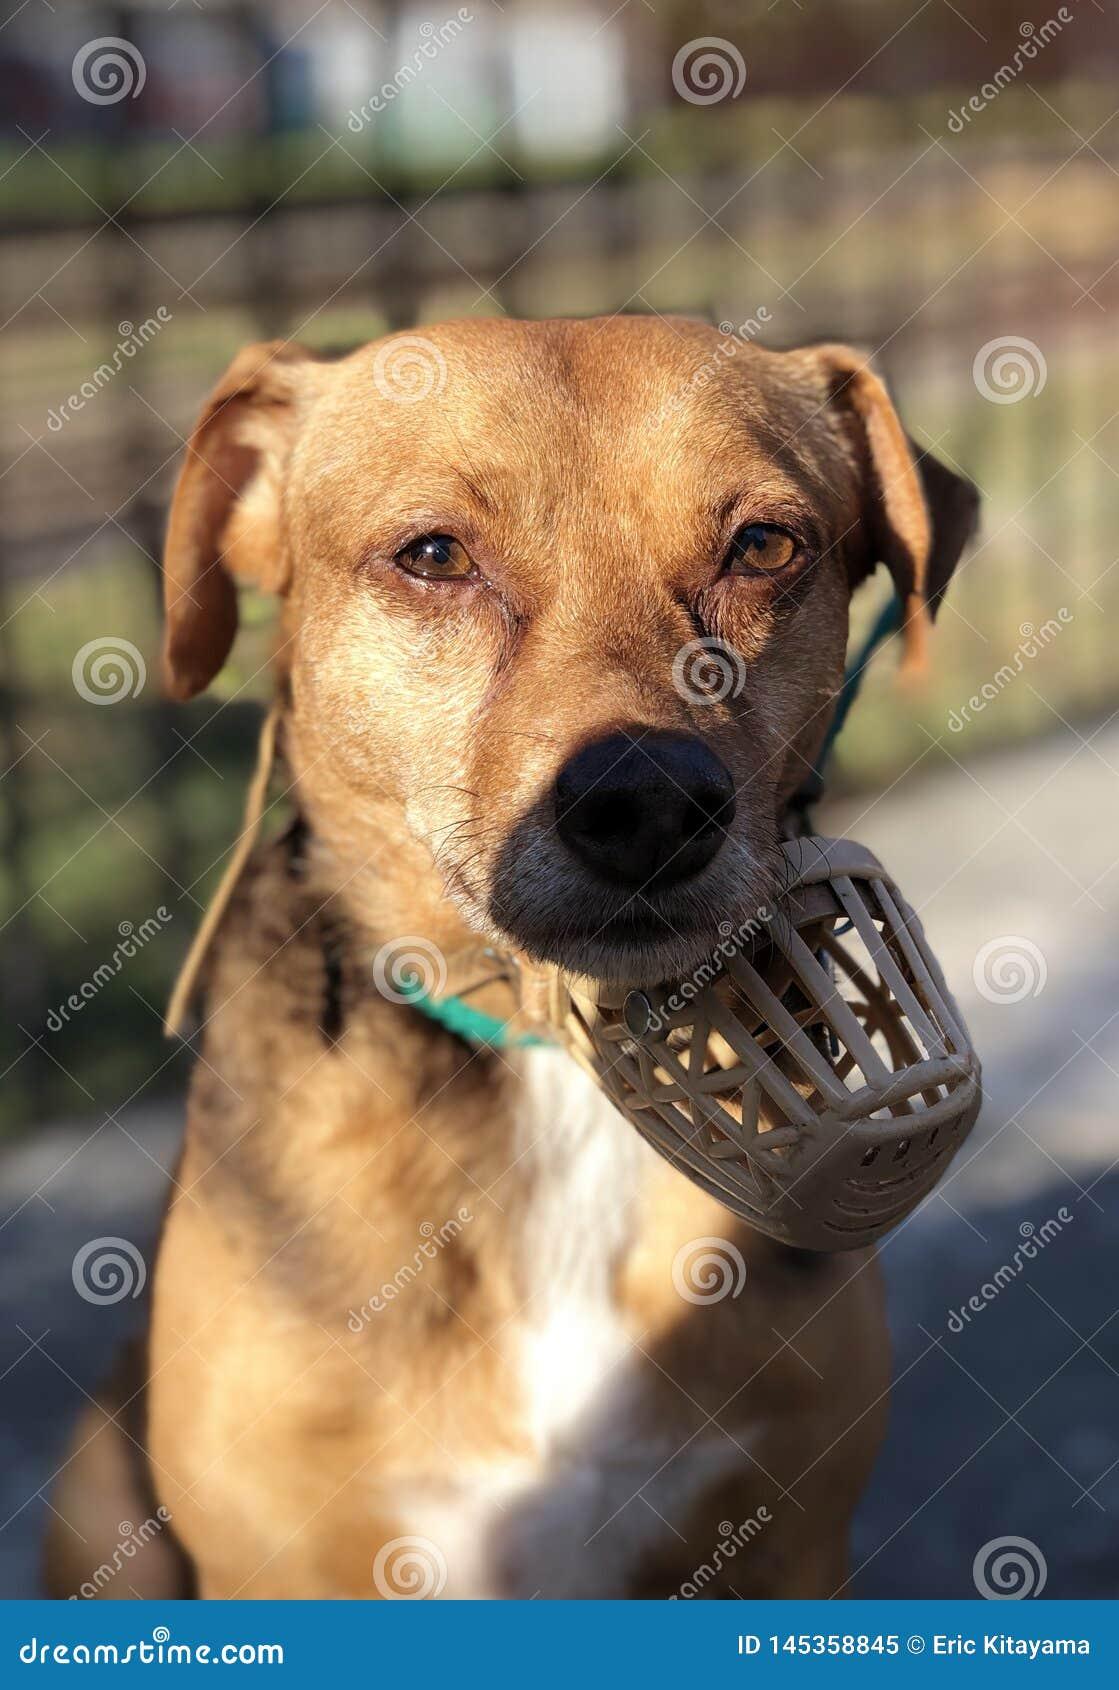 Angry dog stock image  Image of meme, camera, watching